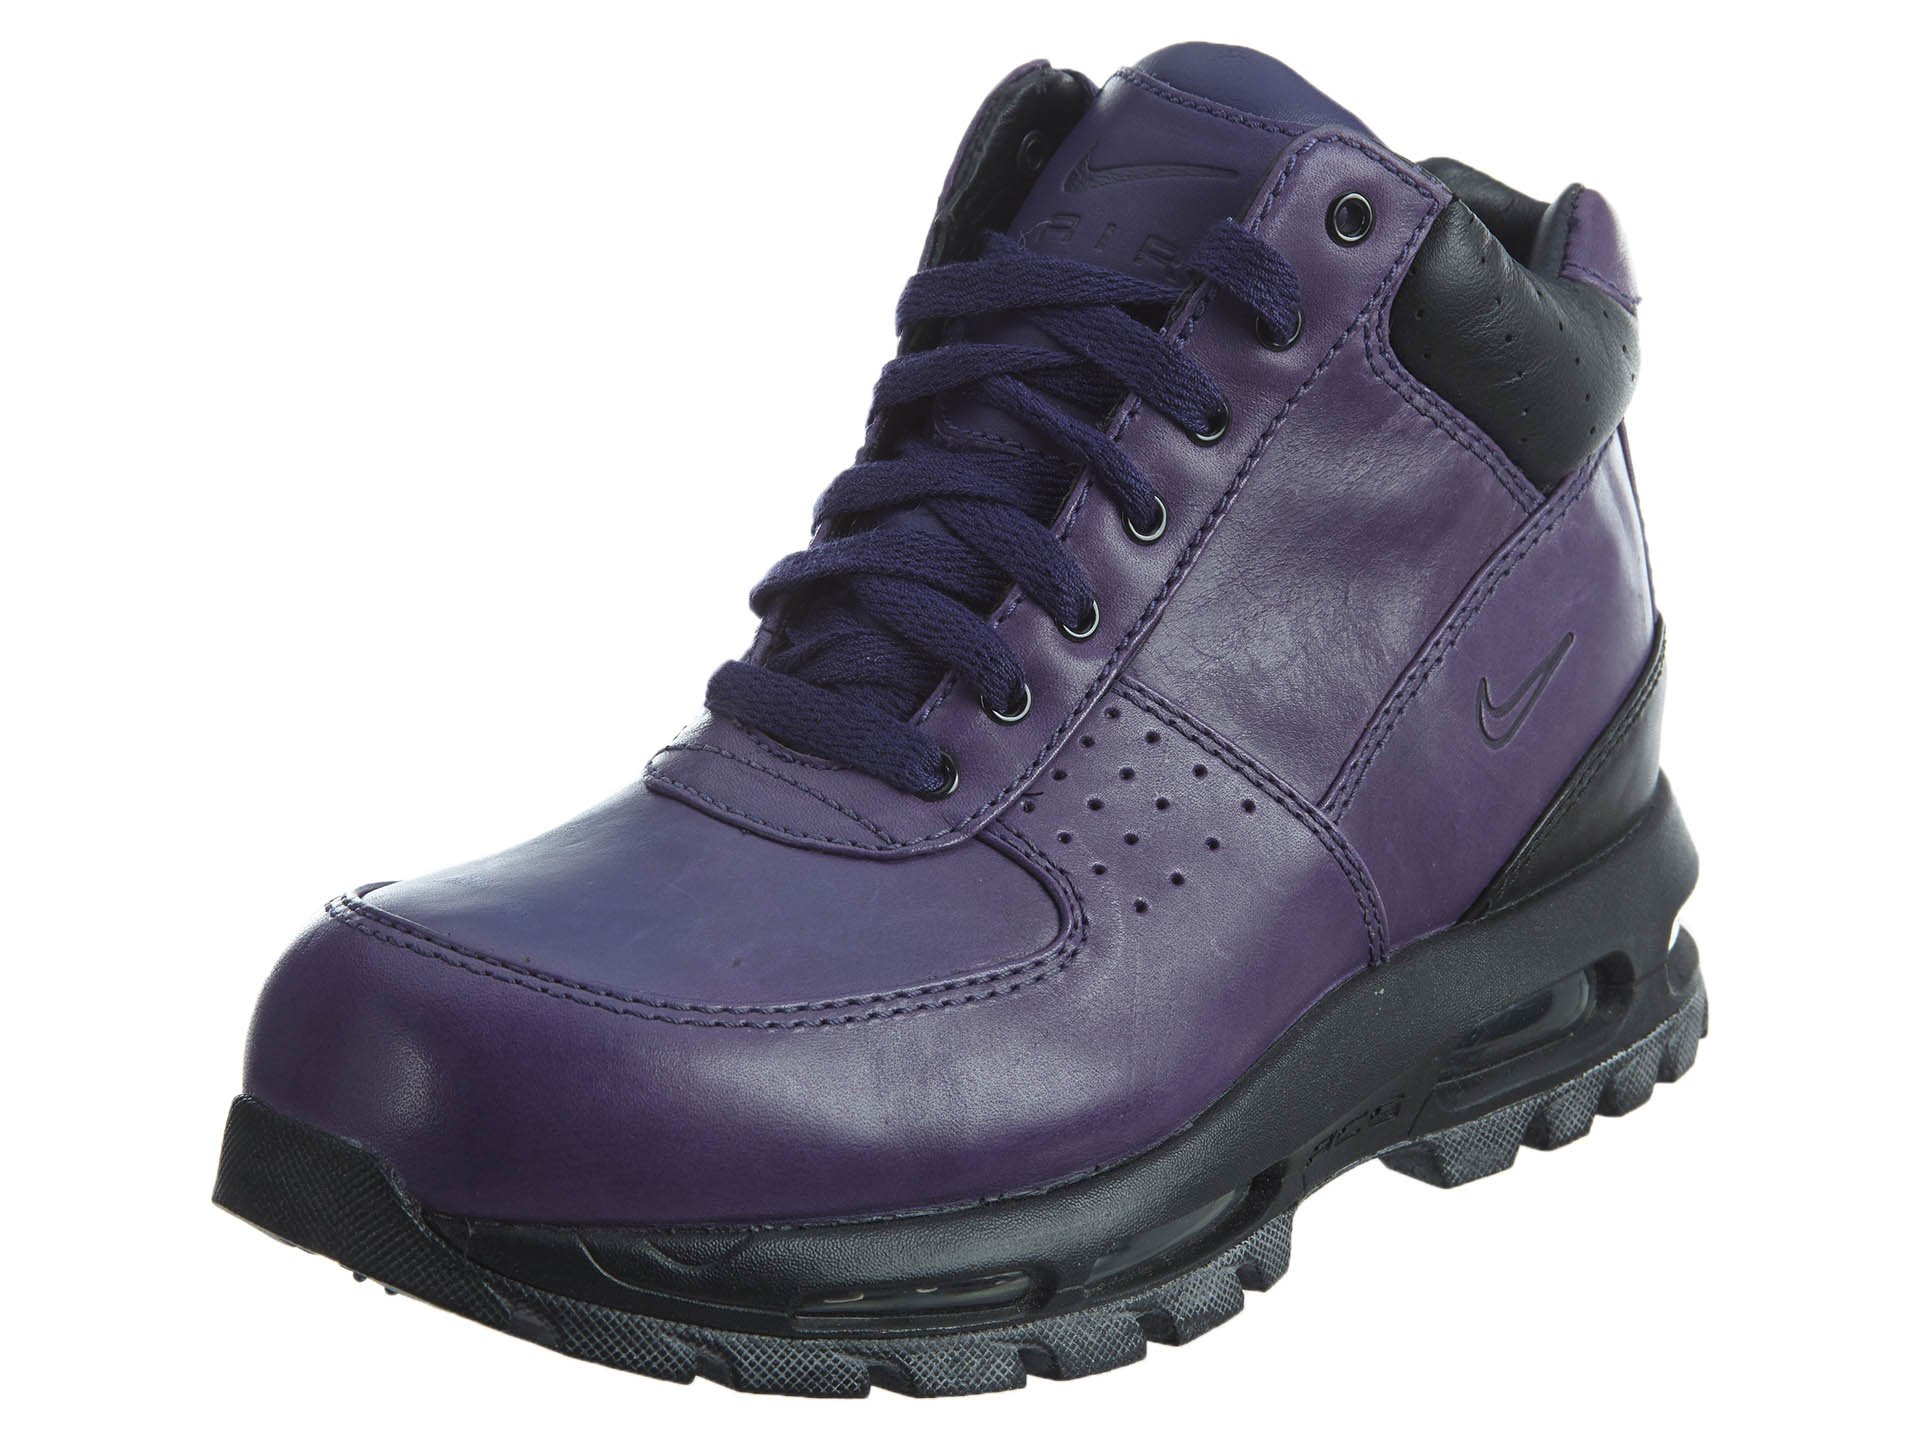 Nike Air Max Goadome (GS) ACG Big Kids Boots 311567-500 Ink 4 M US